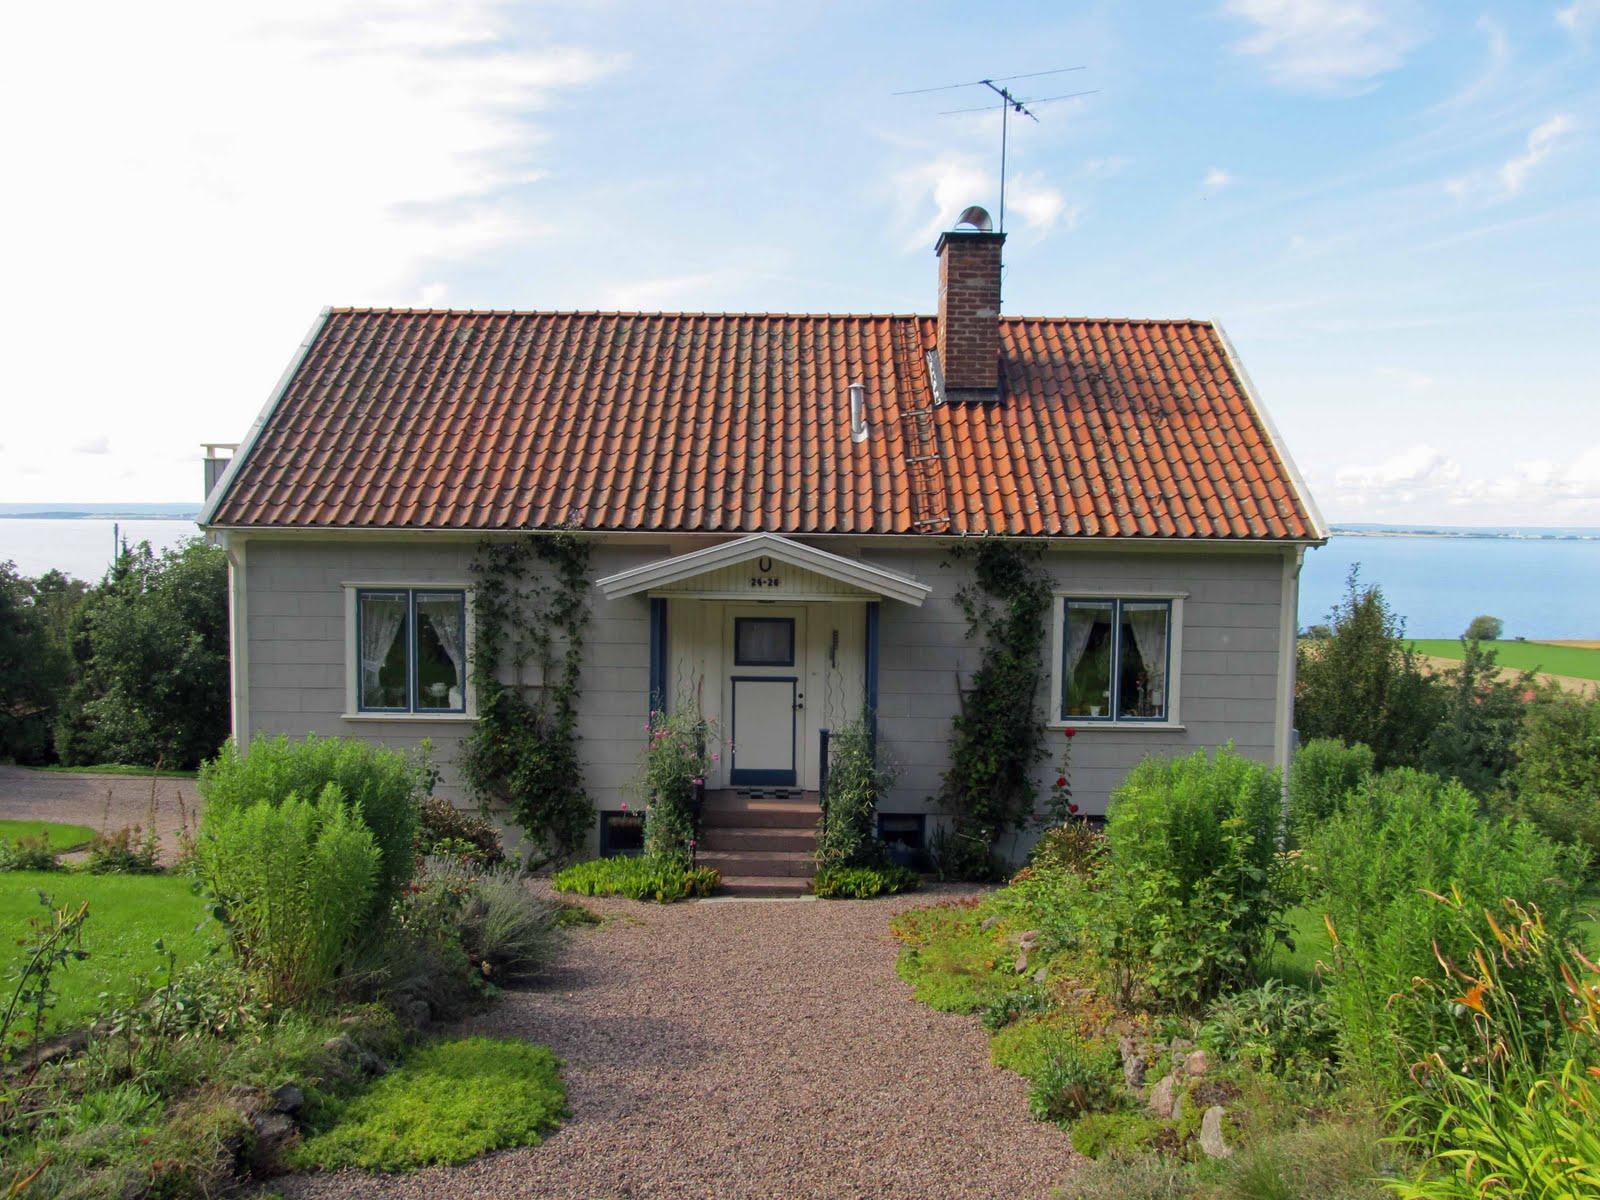 Summit Musings: Gaily Painted Houses & Polkagris in Sweden